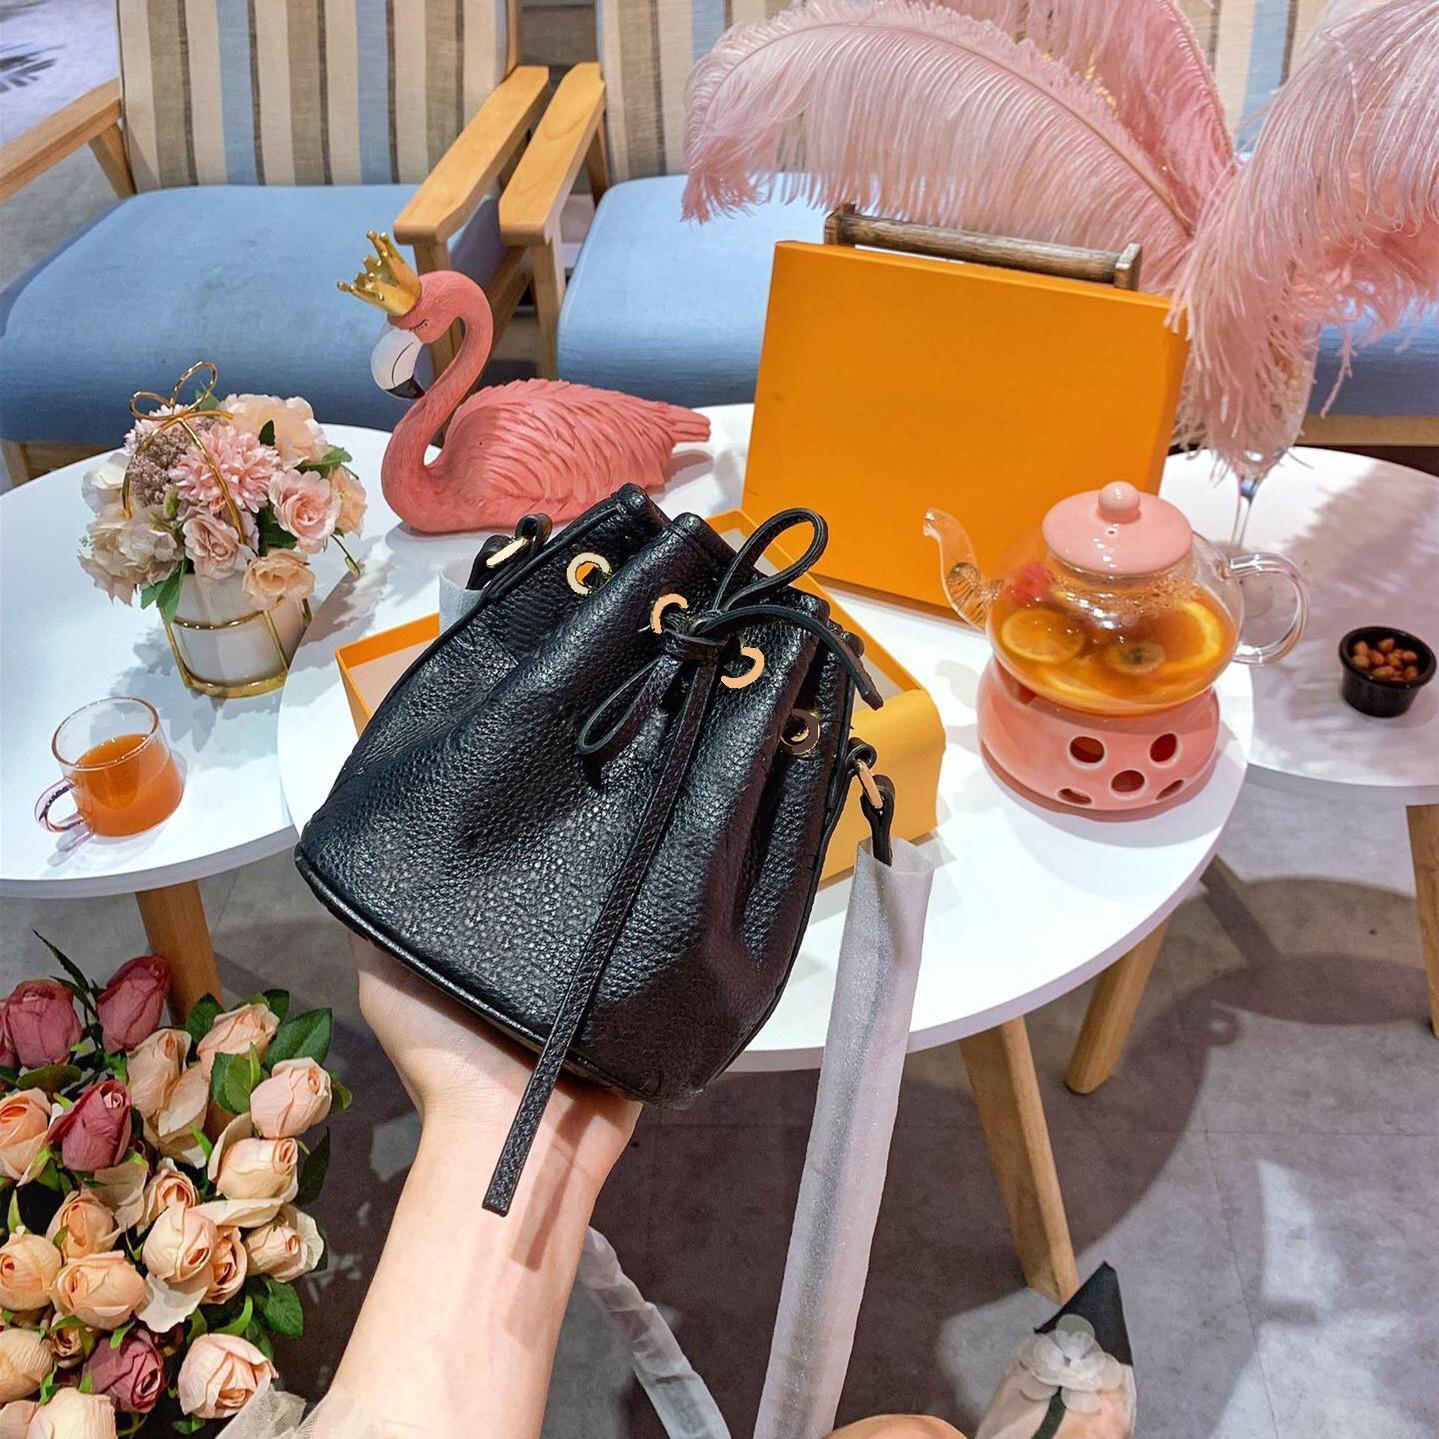 Designer Lady Moda Bolsas Bolsas de Ombro Diagonal Saco de alta qualidade de couro Bucket Bag Mini G Flor Carteira frete grátis